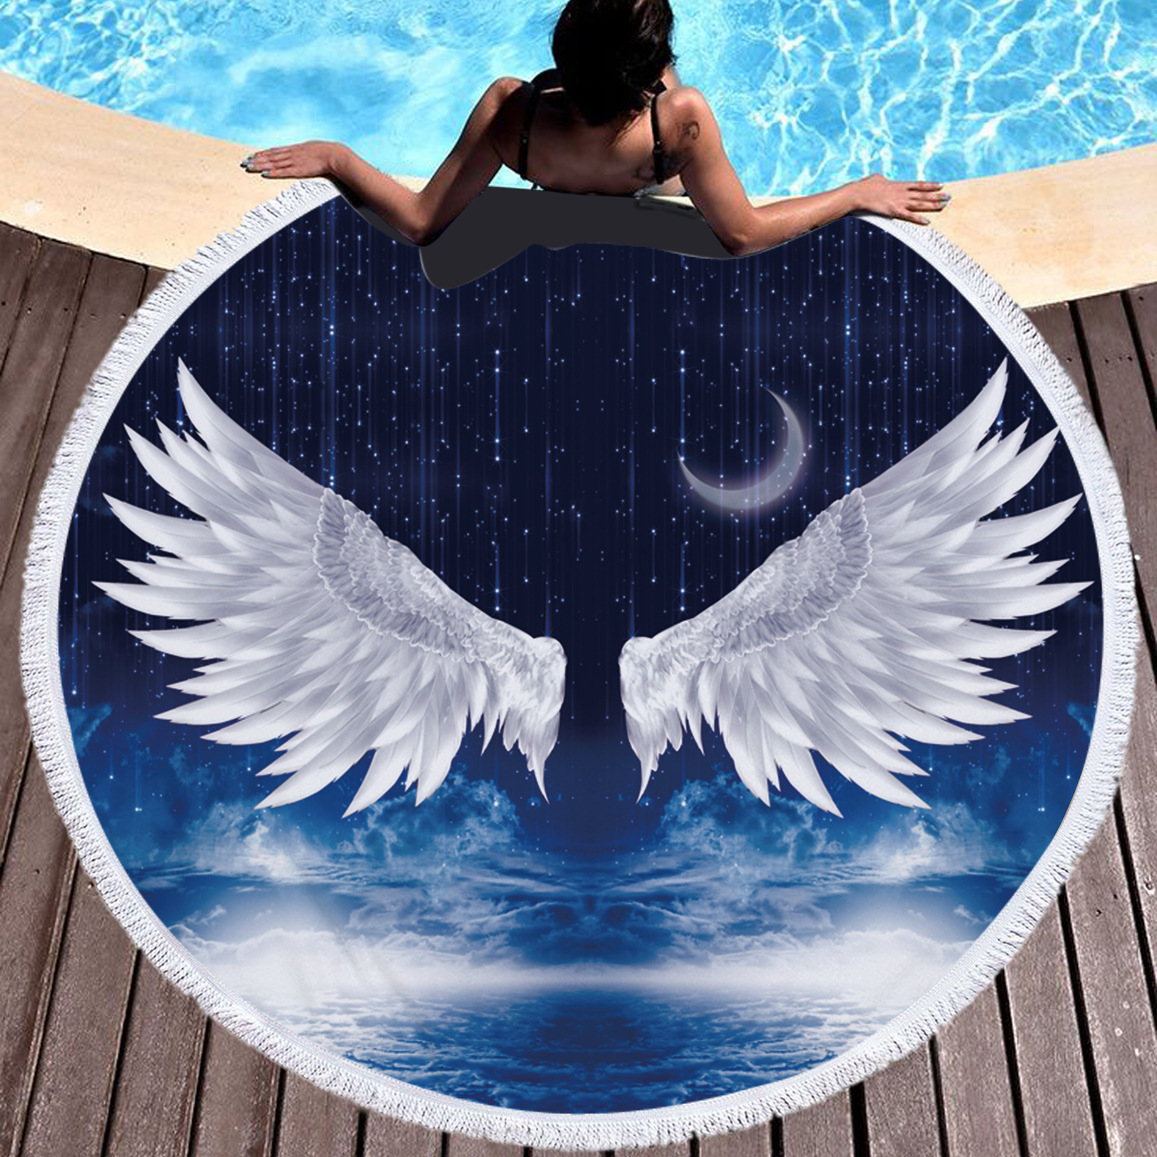 3D Angel Wings Printed Microfiber Round Beach Towel Bath Towels For Adults Kids Yoga Mat Tassels Blanket Home Decor